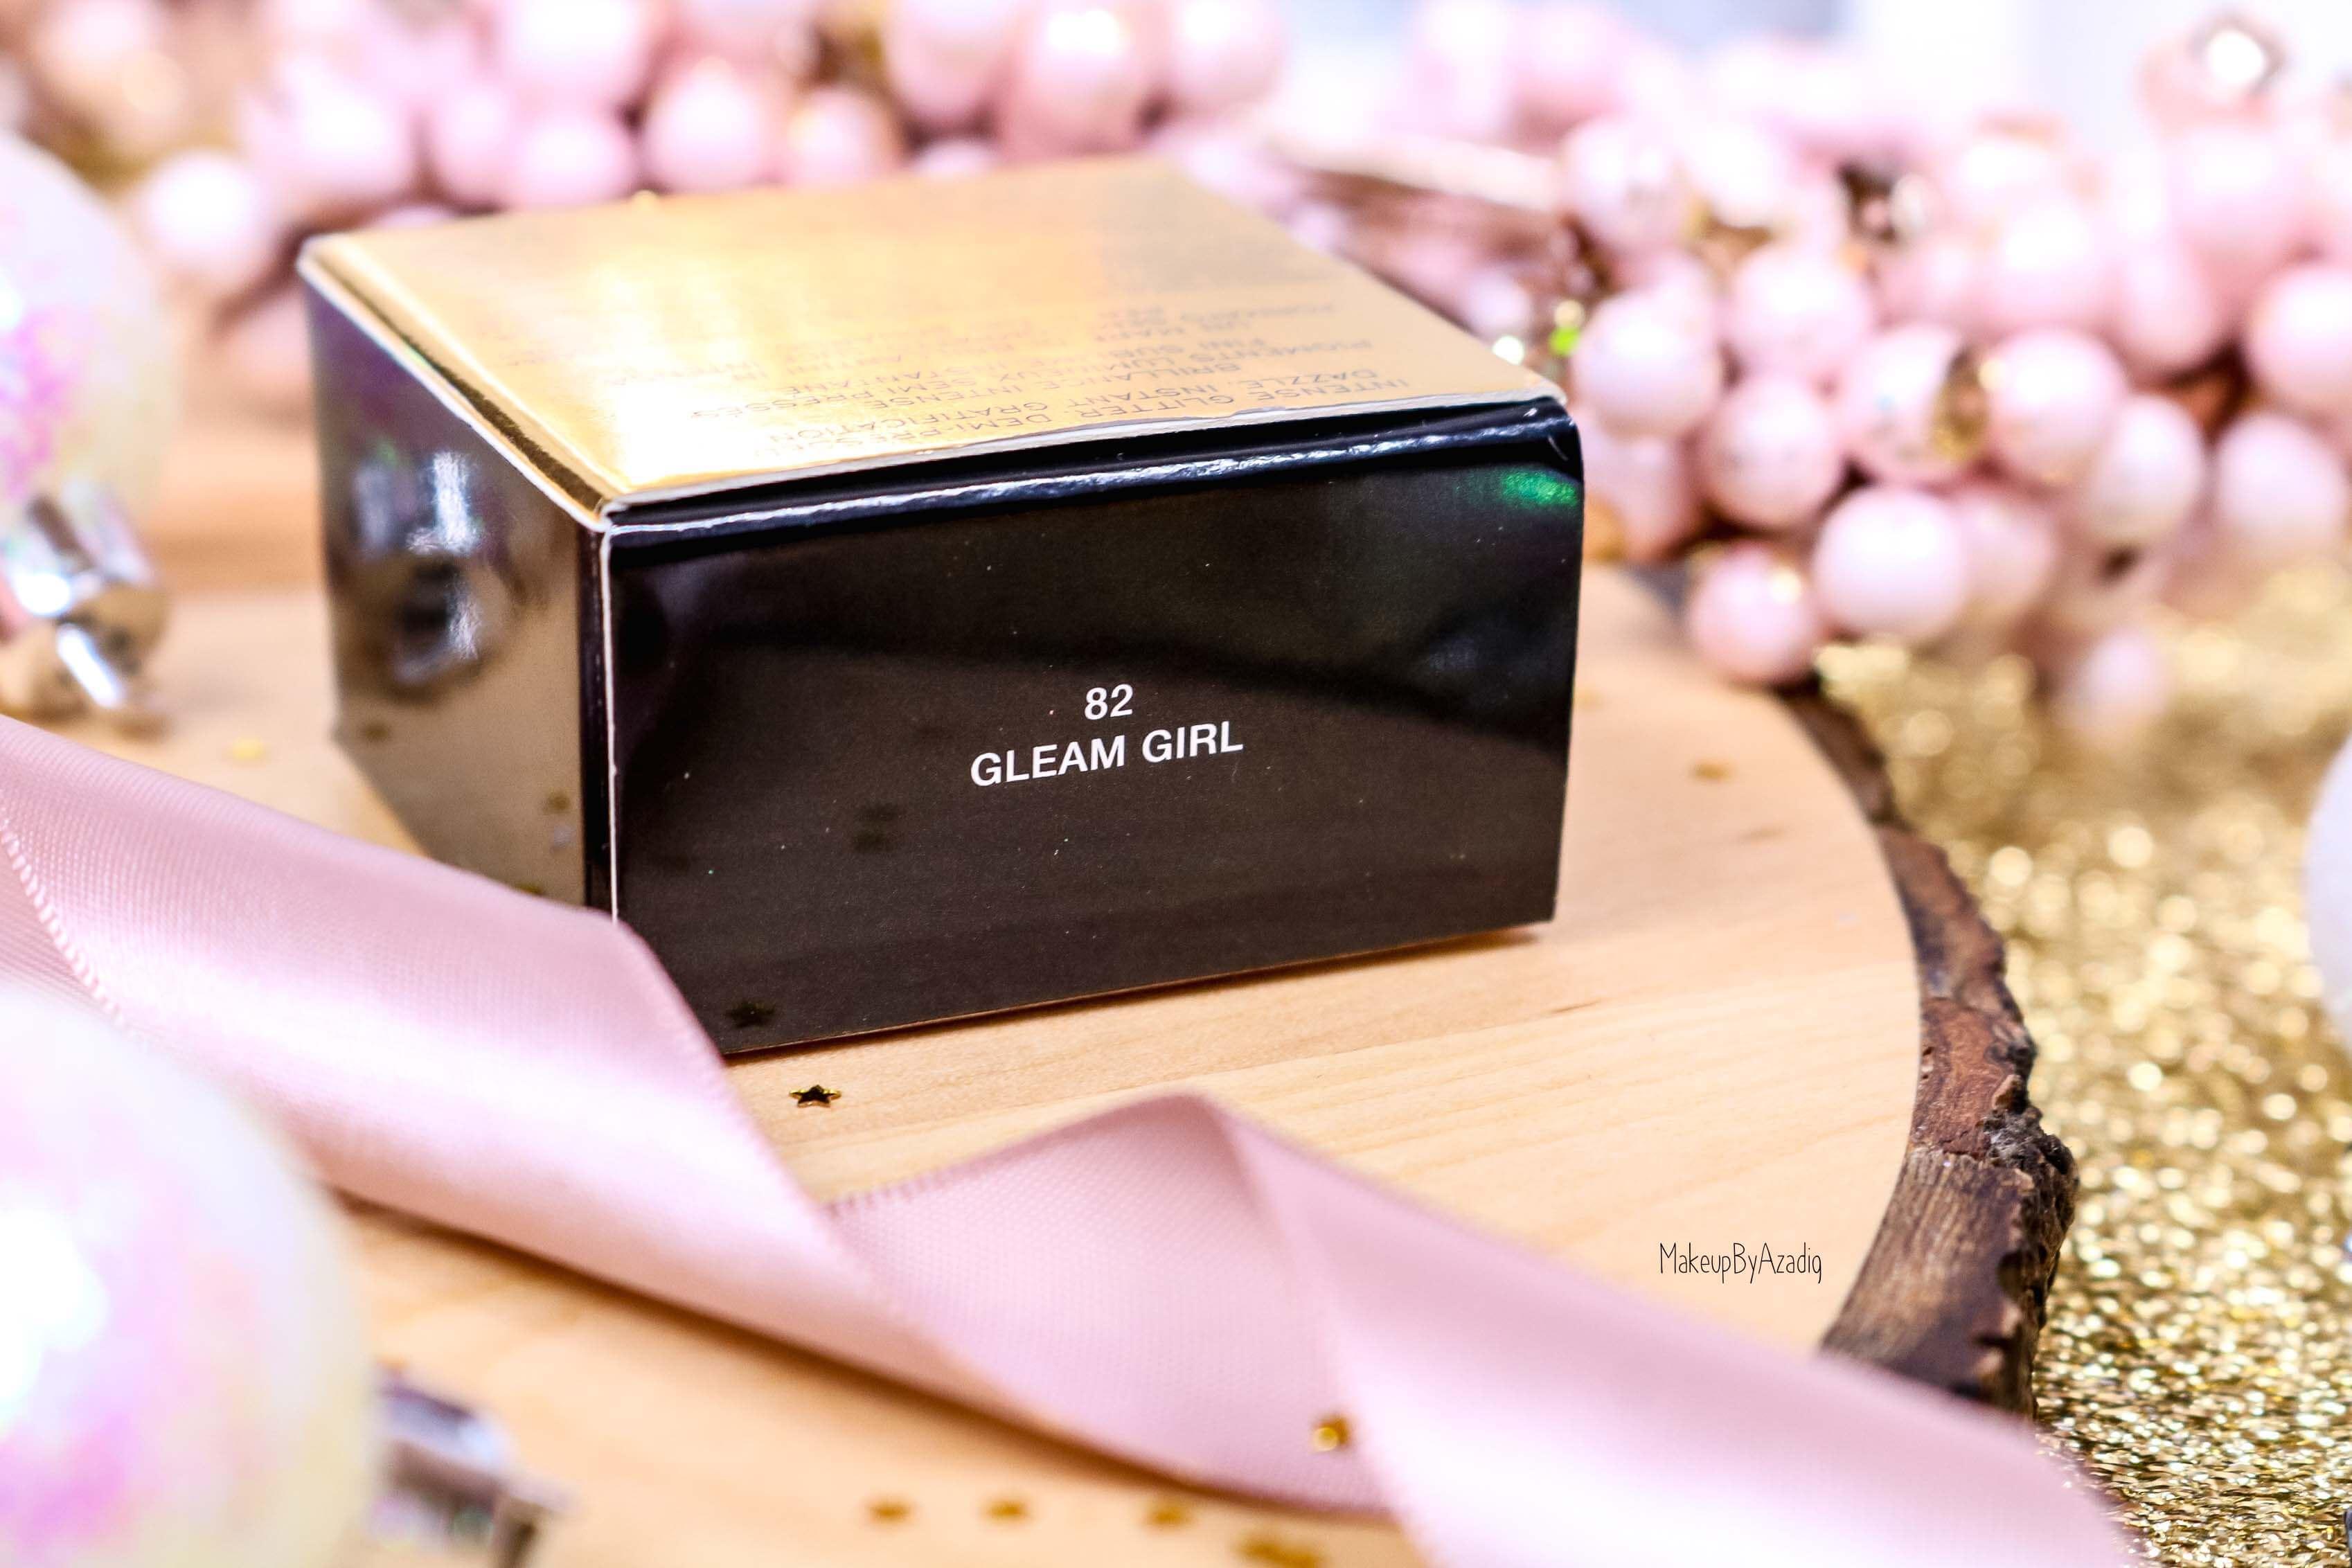 revue-fard-paupieres-paillete-marc-jacobs-beauty-gleam-girl-makeupbyazadig-avis-prix-swatch-see-quins